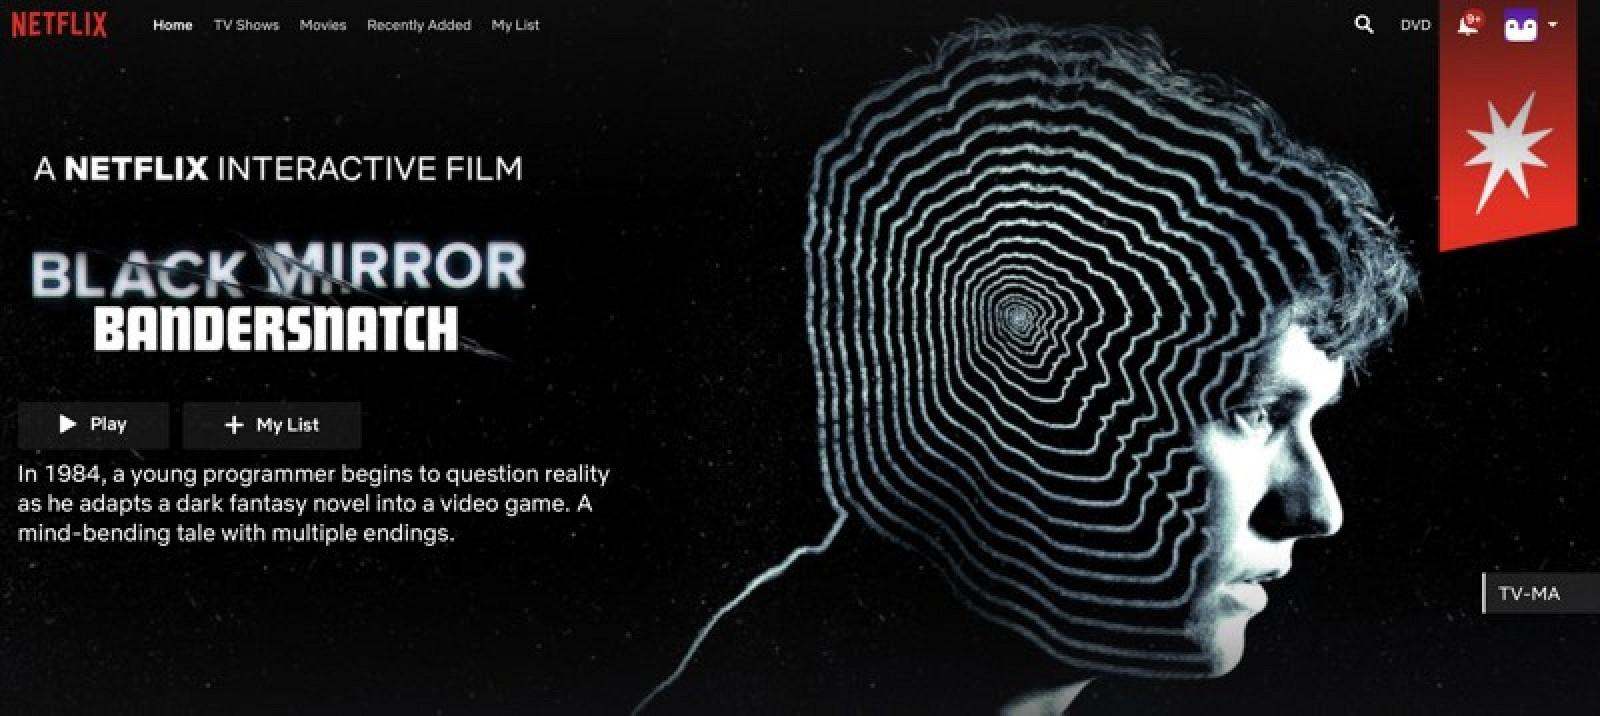 Netflix's New Interactive 'Black Mirror: Bandersnatch' Episode Doesn